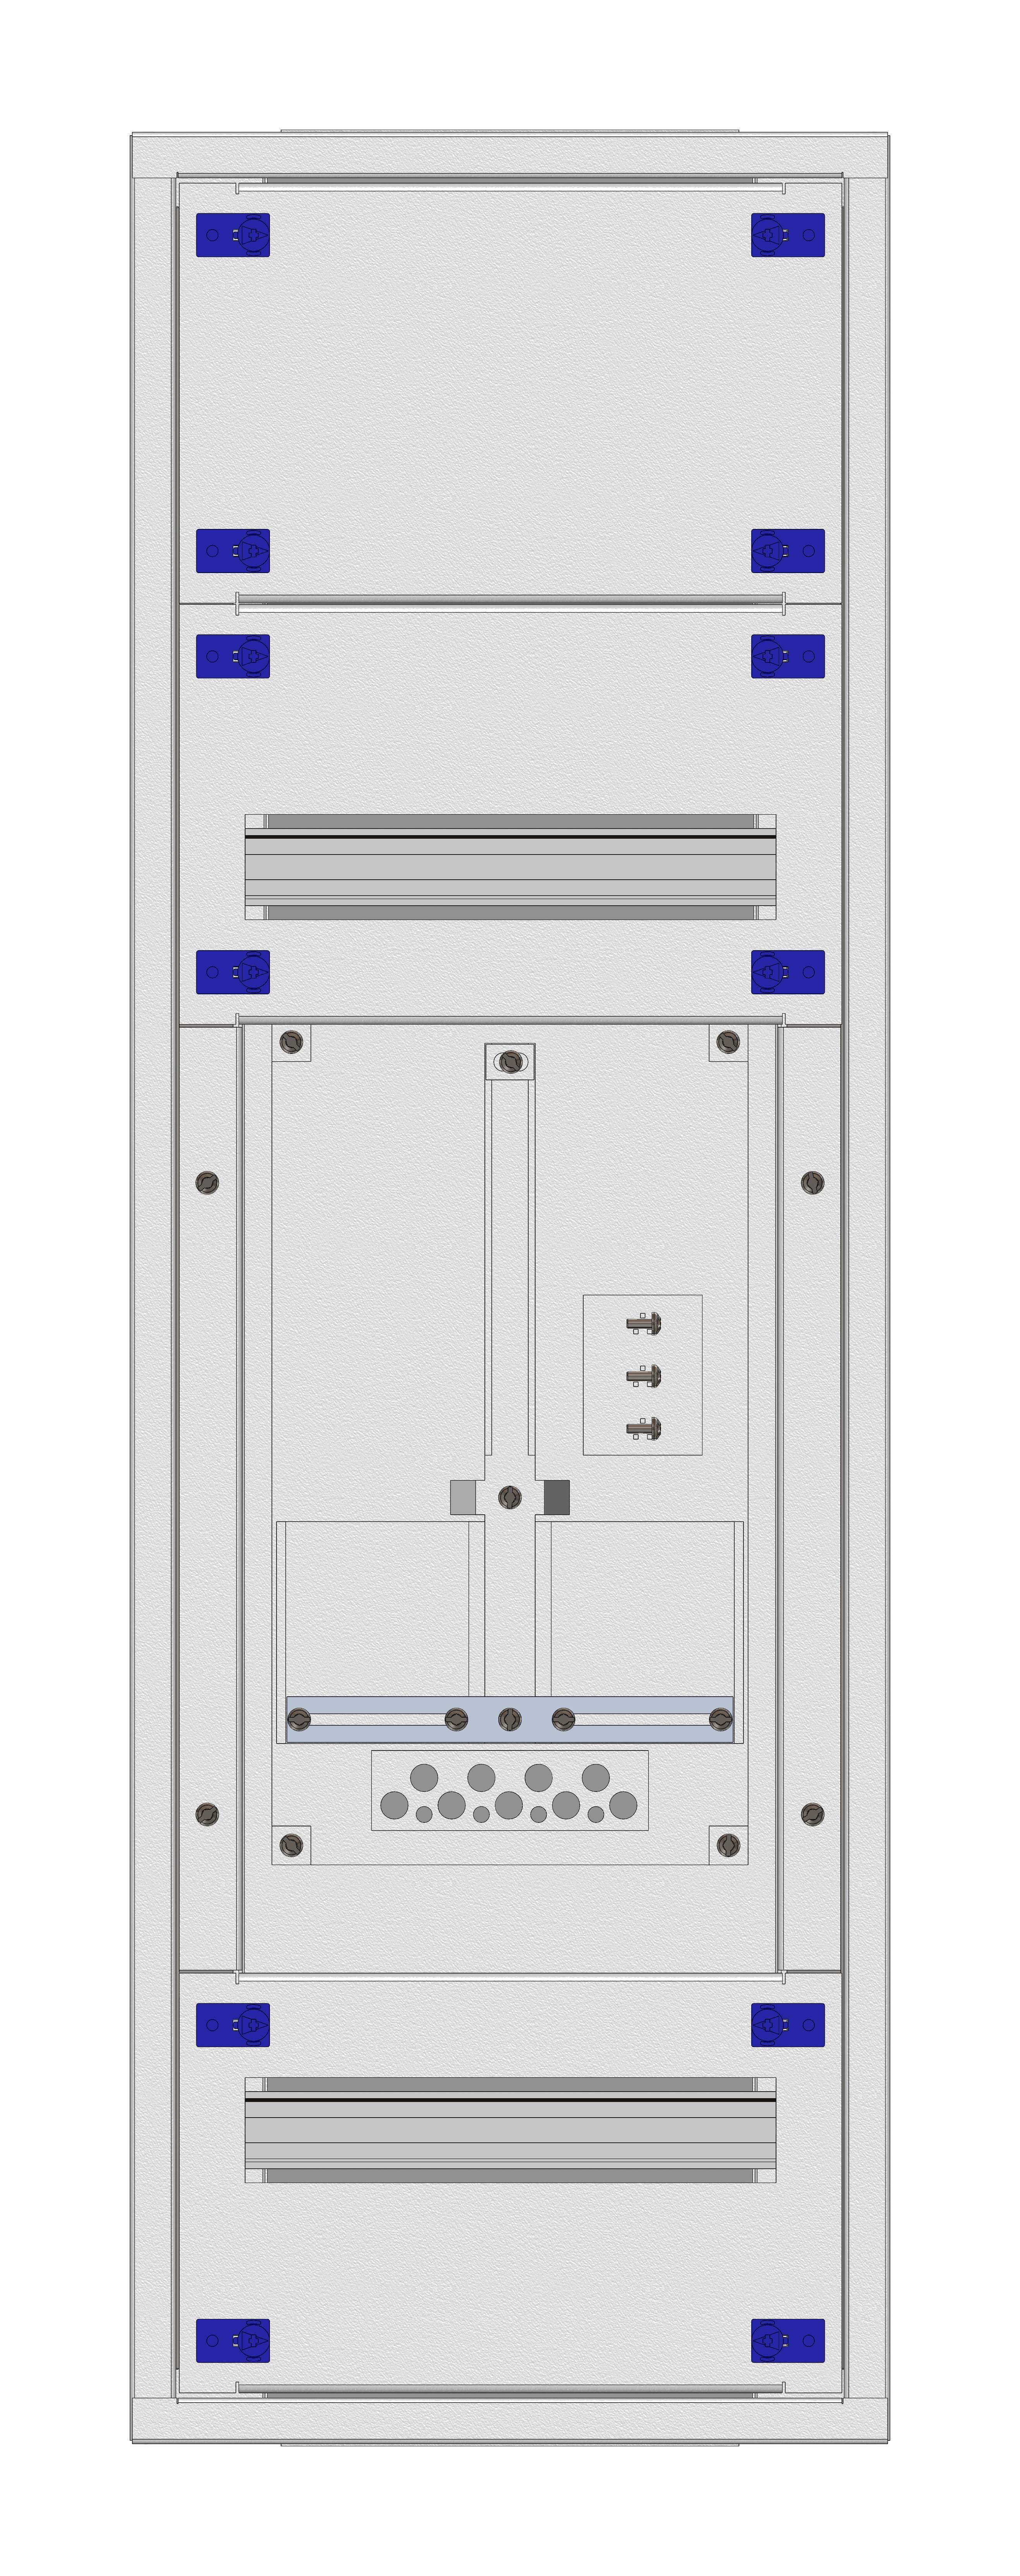 1 Stk Aufputz-Zählerverteiler 1A-21E/VBG 1ZP, H1055B380T250mm IL160121VS